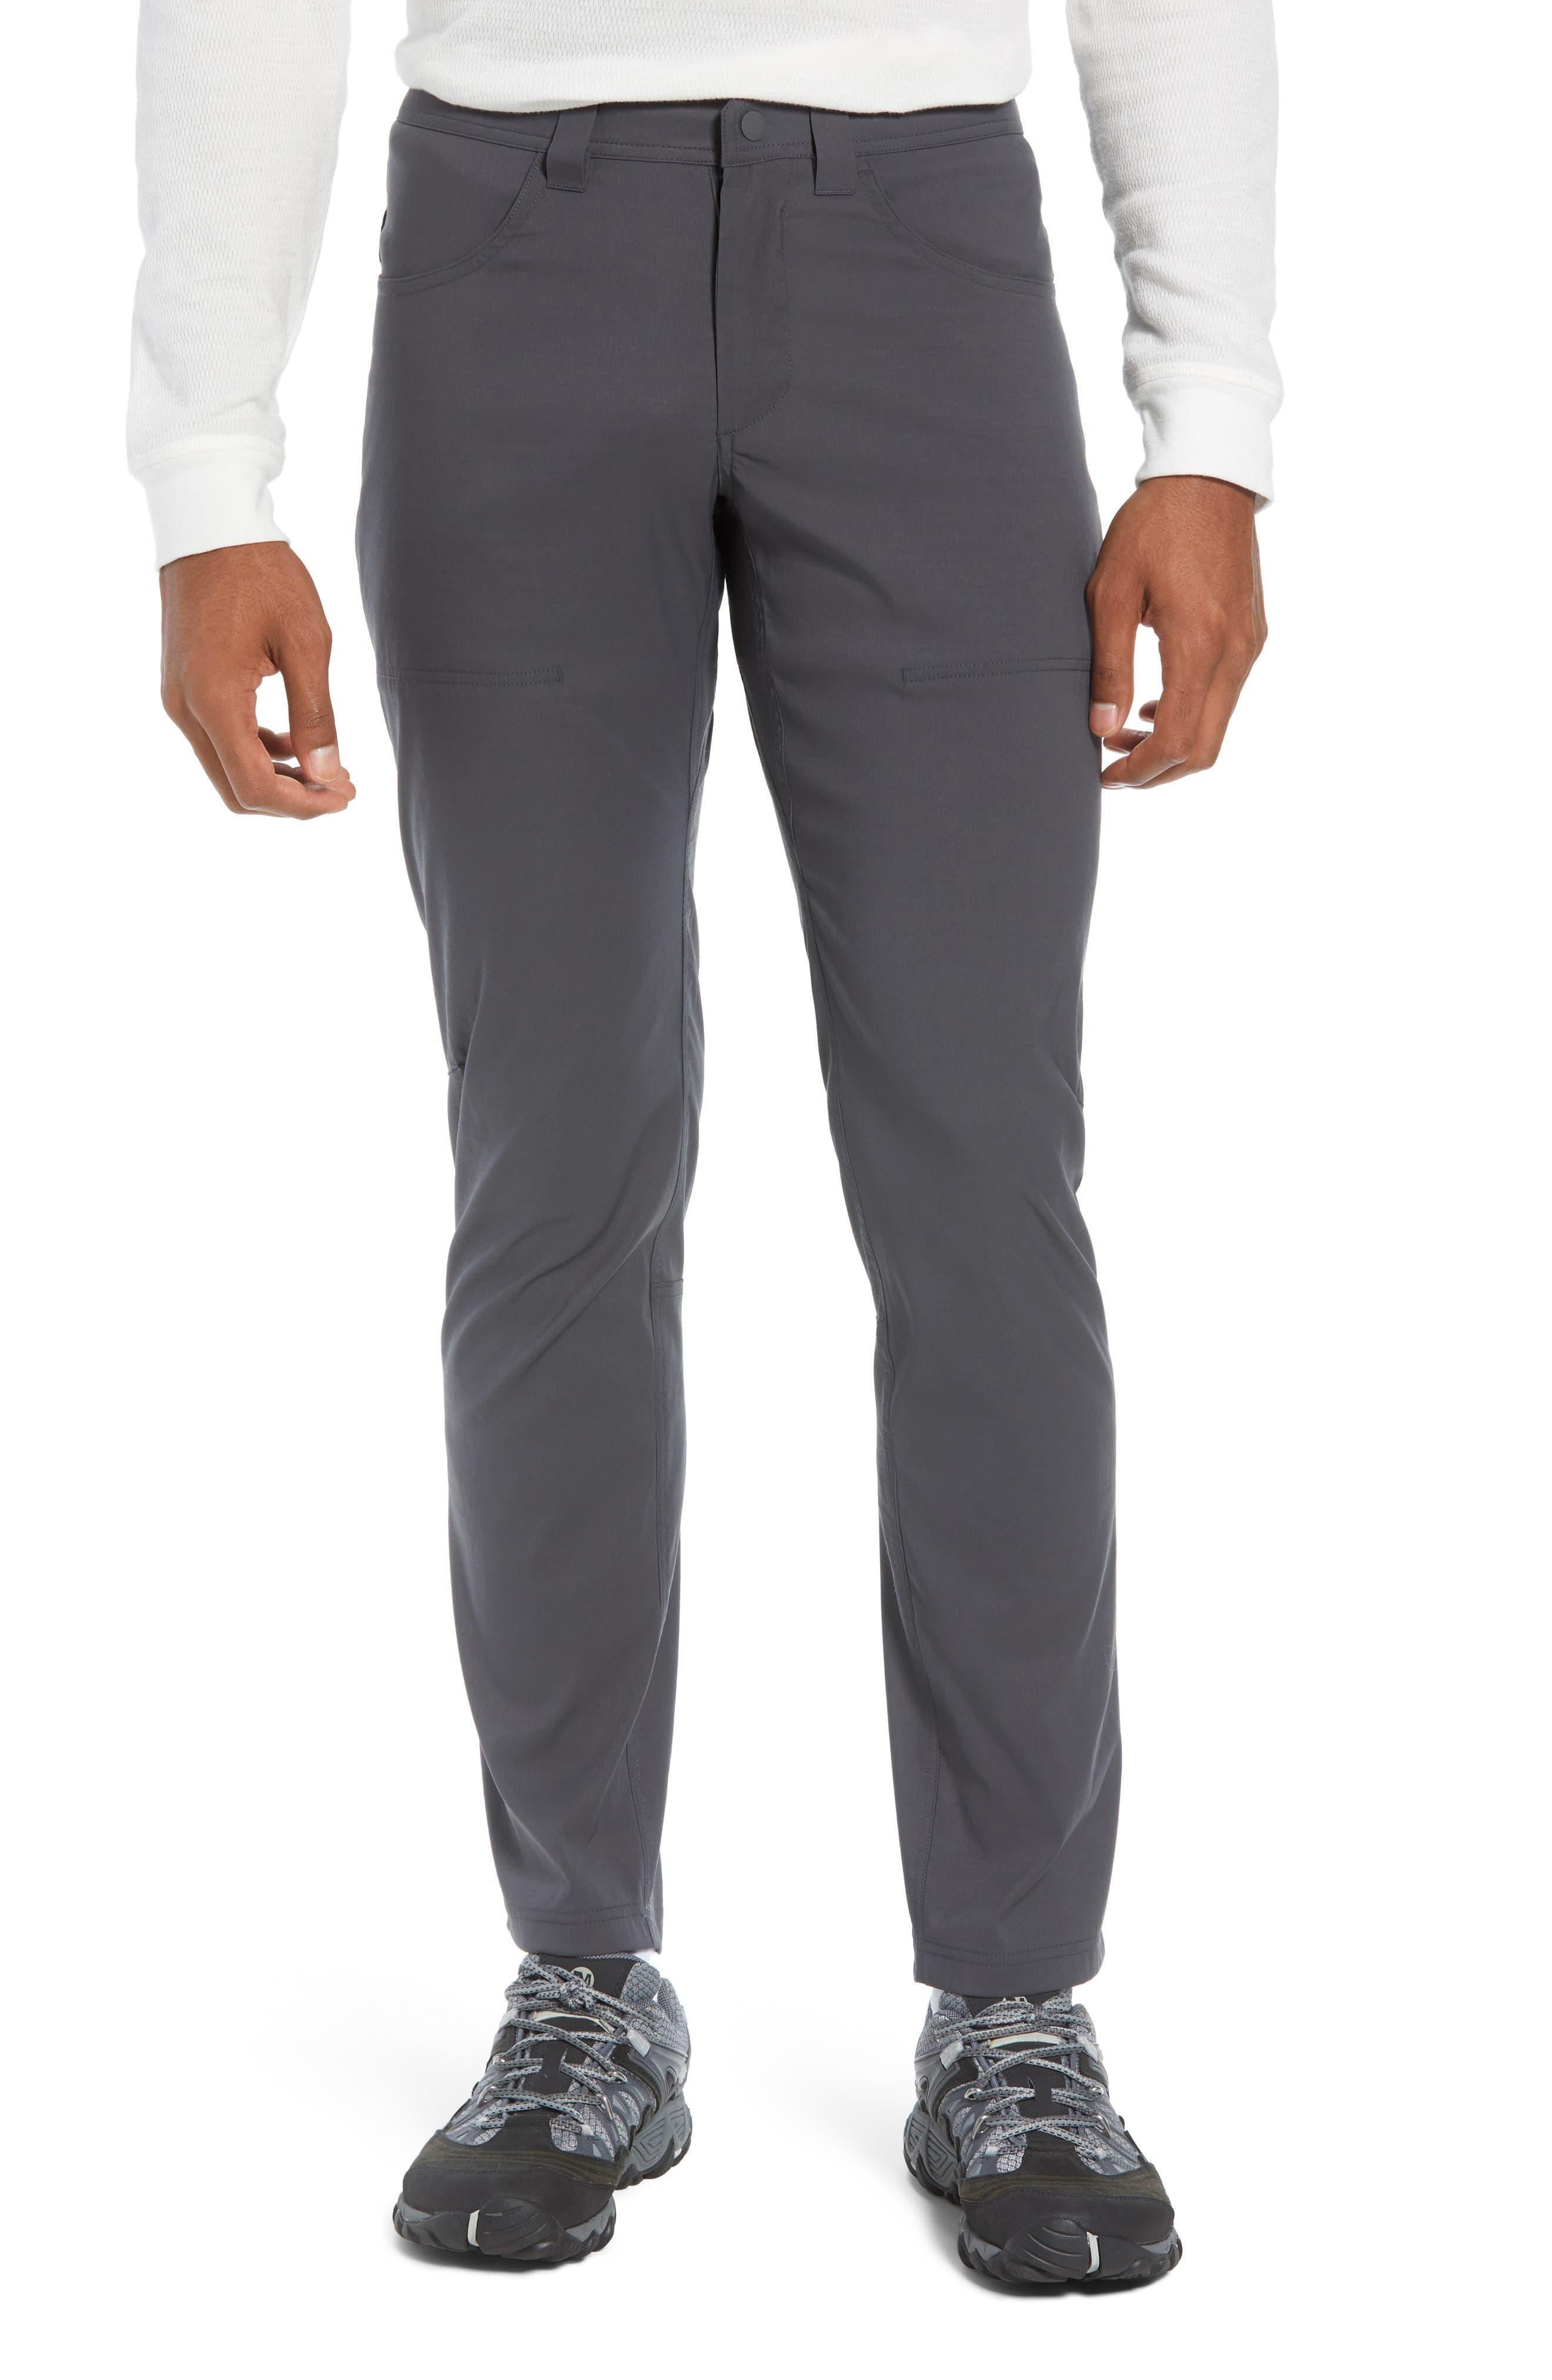 Persist Straight Pants,                         Main,                         color, MONSOON